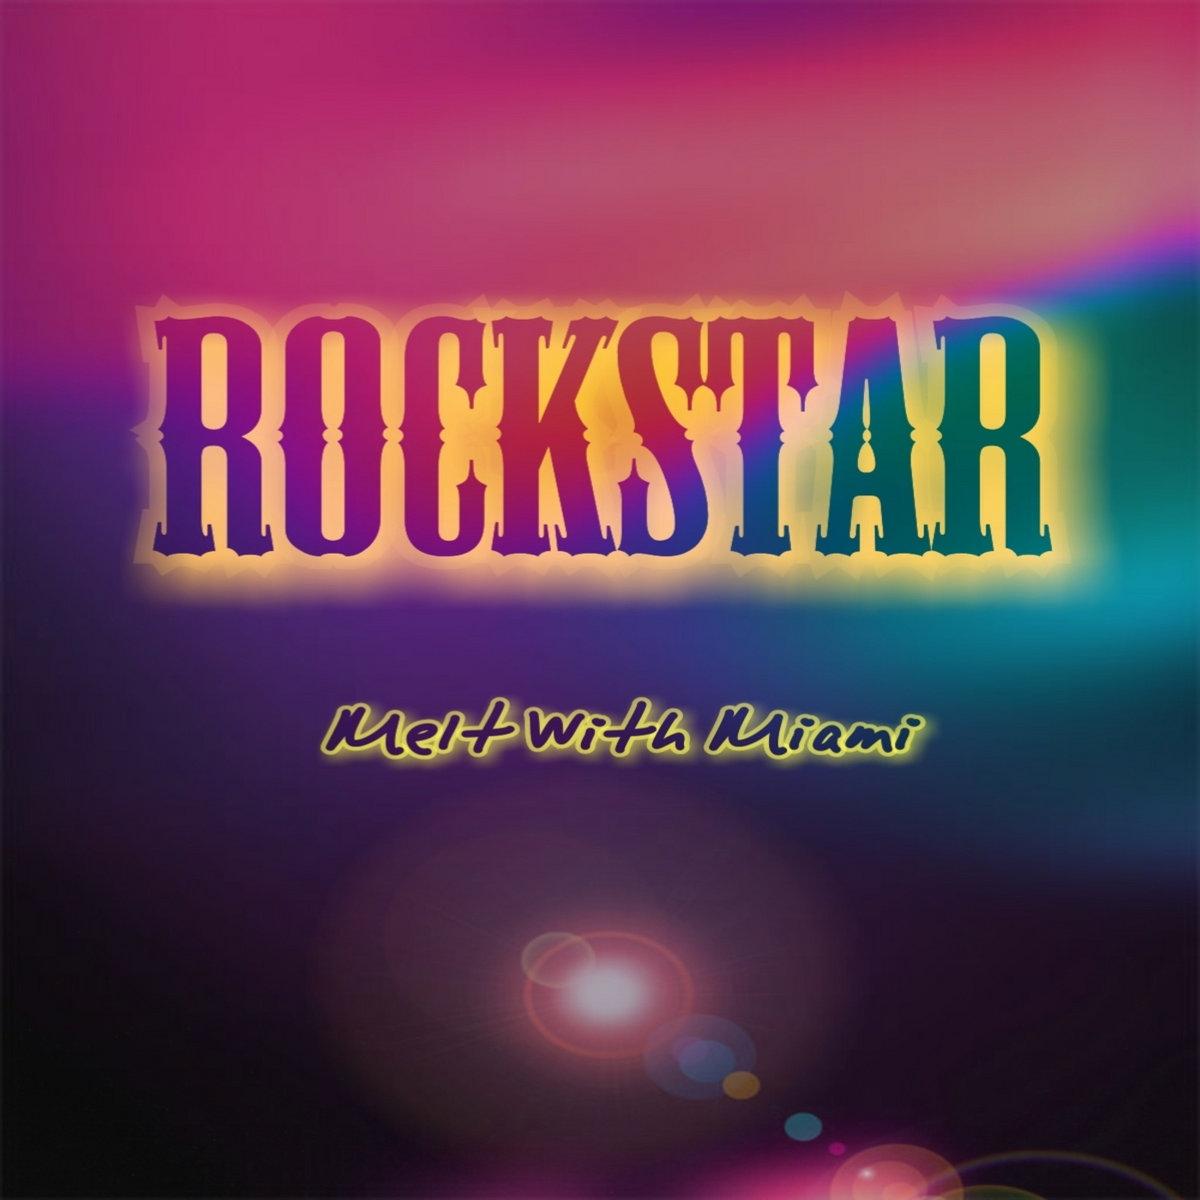 Rockstar-Post Malone ft 21 Savage (Melt With Miami Remix